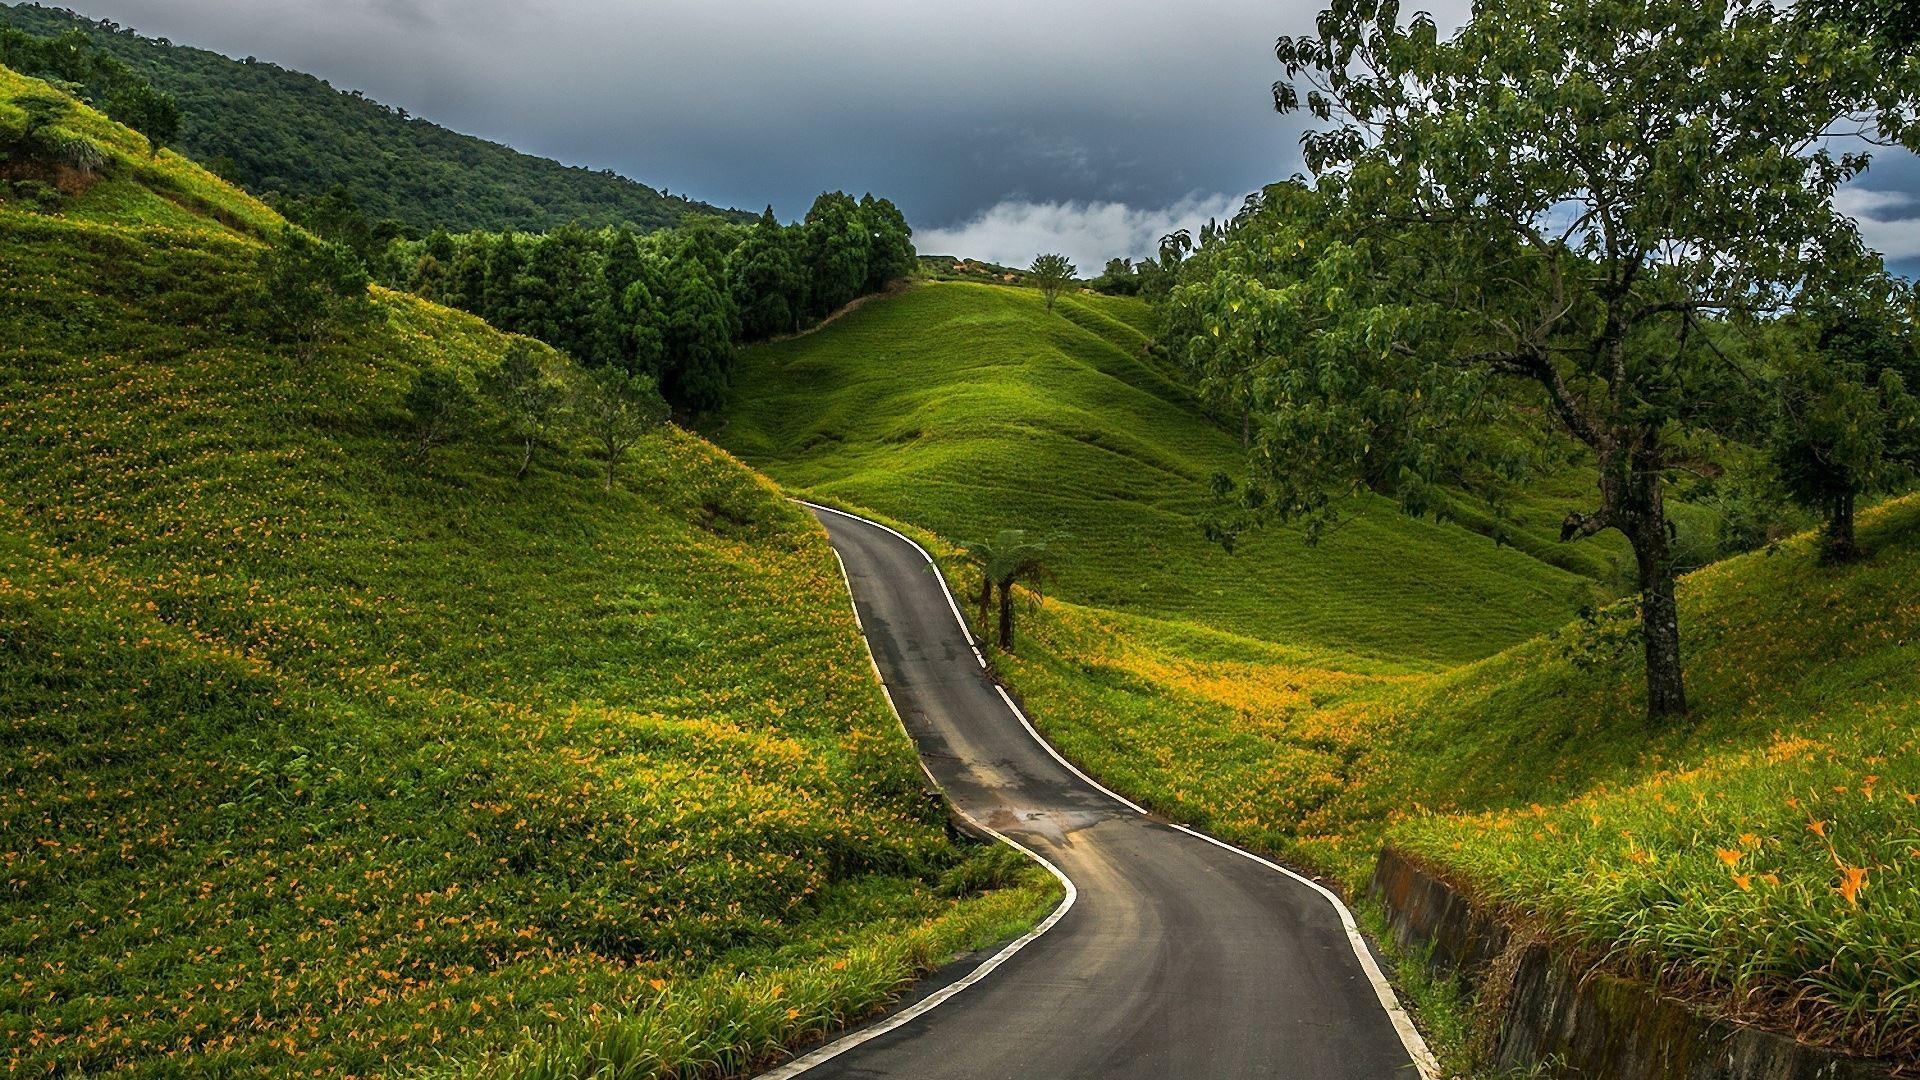 Mountain and road Mac Wallpaper Download | Free Mac ...